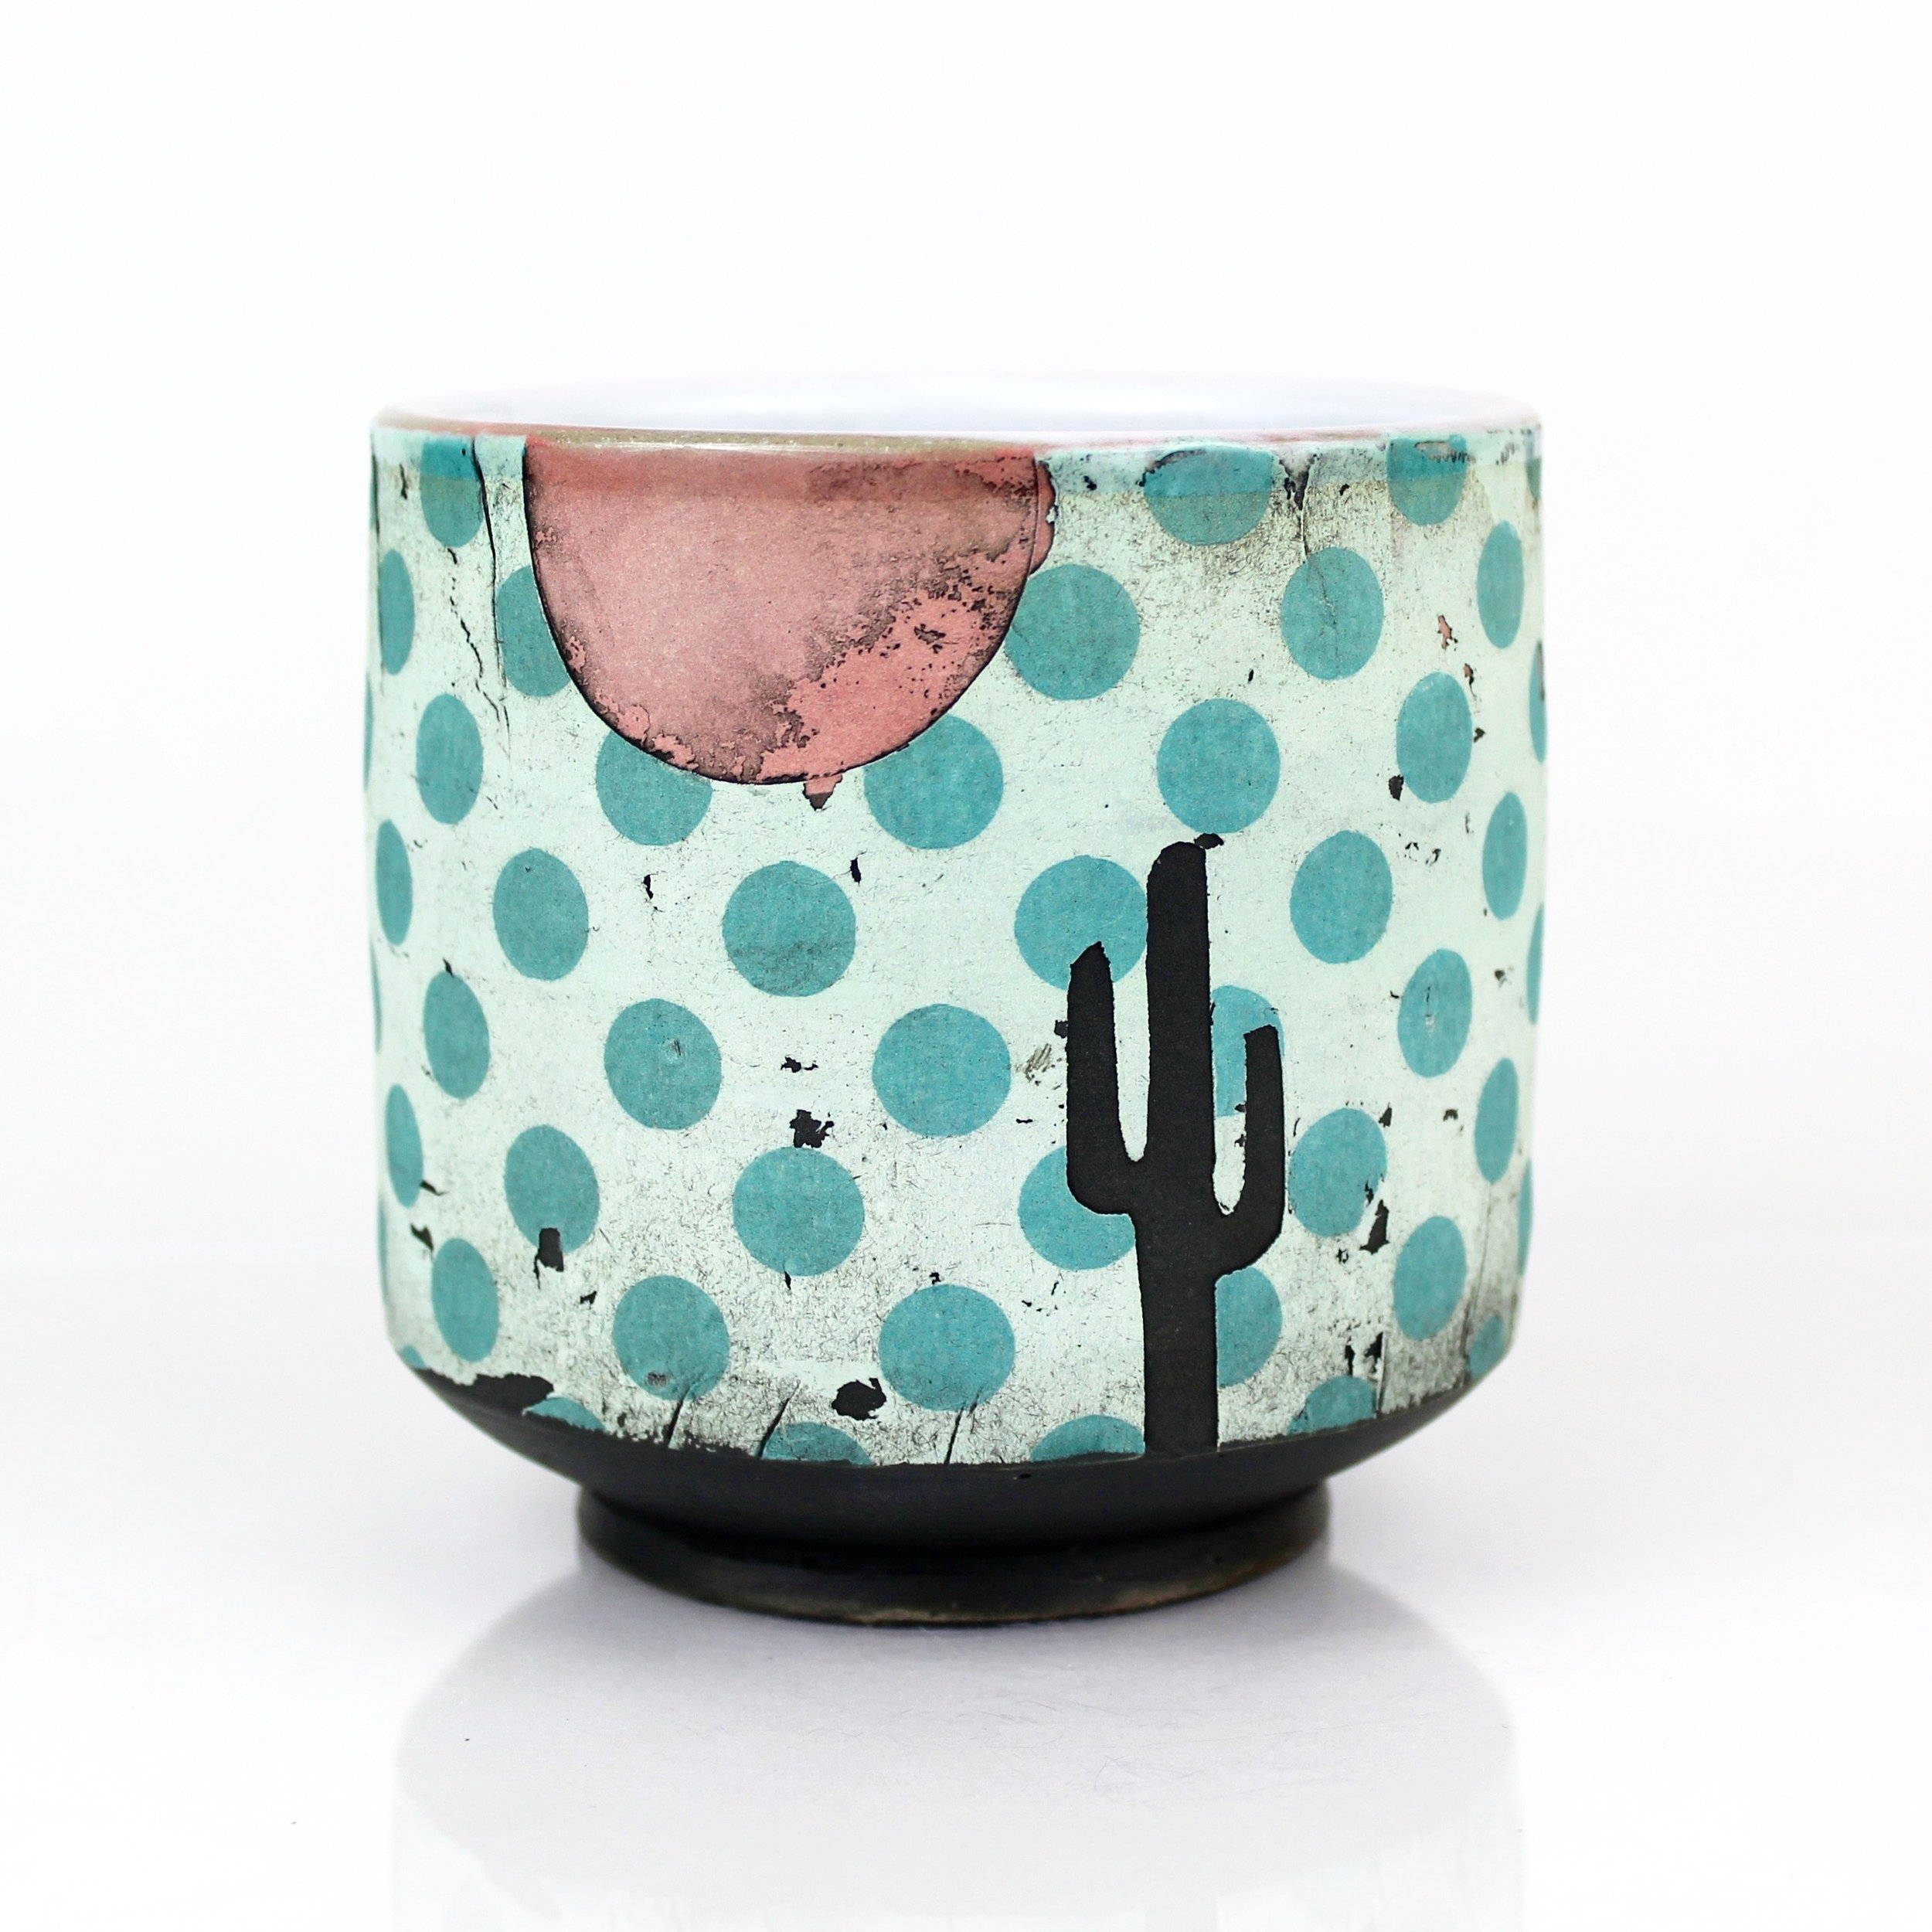 David Kring Ceramics